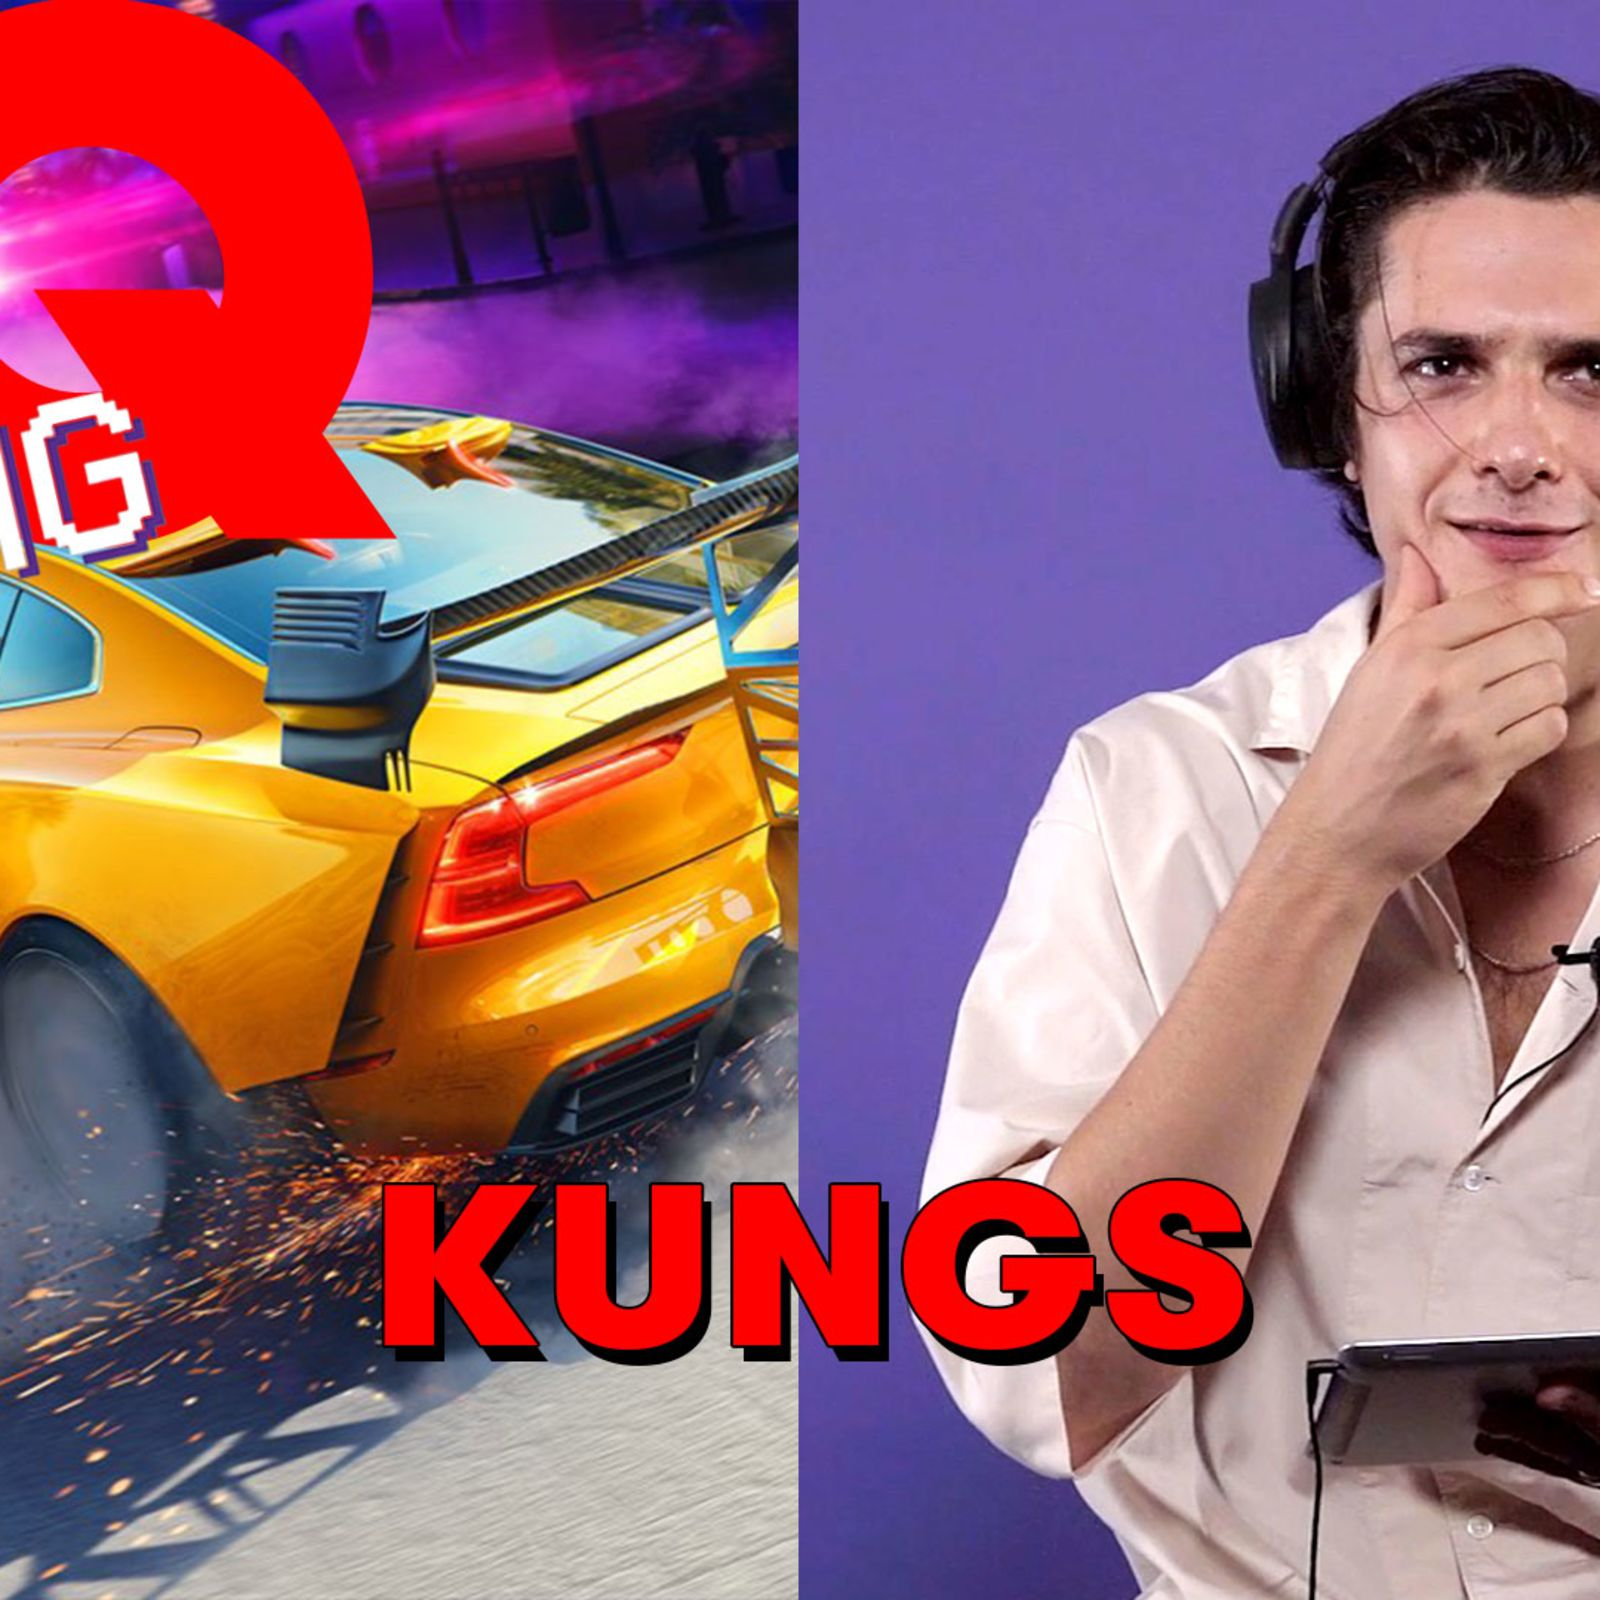 Kungs juge 7 succès du gaming | Battlefield, PUBG, Need For Speed